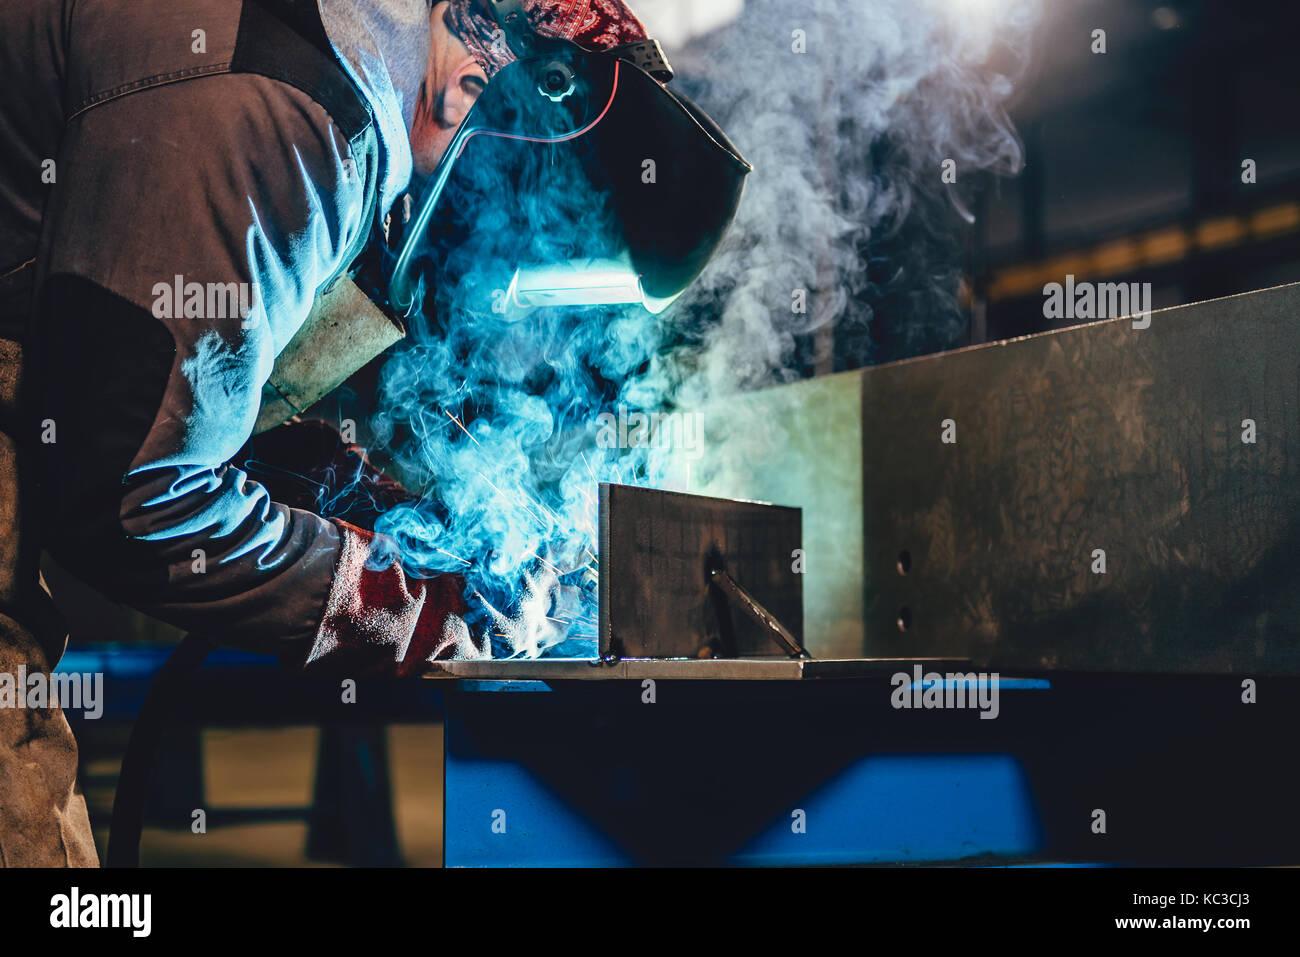 Industrial Welder With Torch and Protective Helmet in big hall welding metal profiles - Stock Image